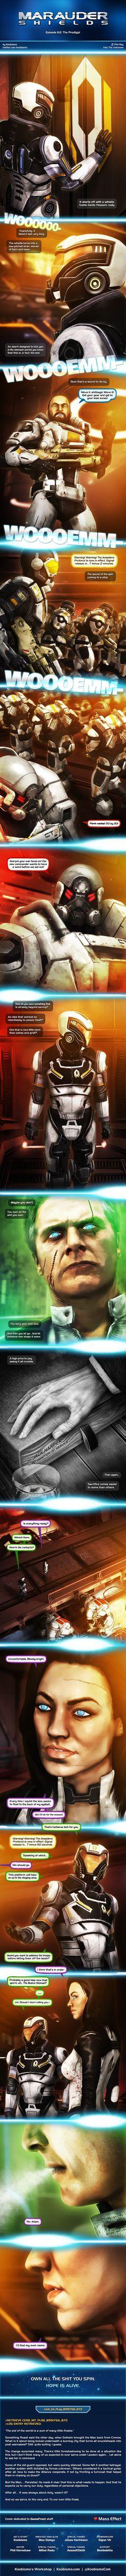 Marauder Shields: Episode 62 (The Prodigal) by koobismo.deviantart.com on @DeviantArt